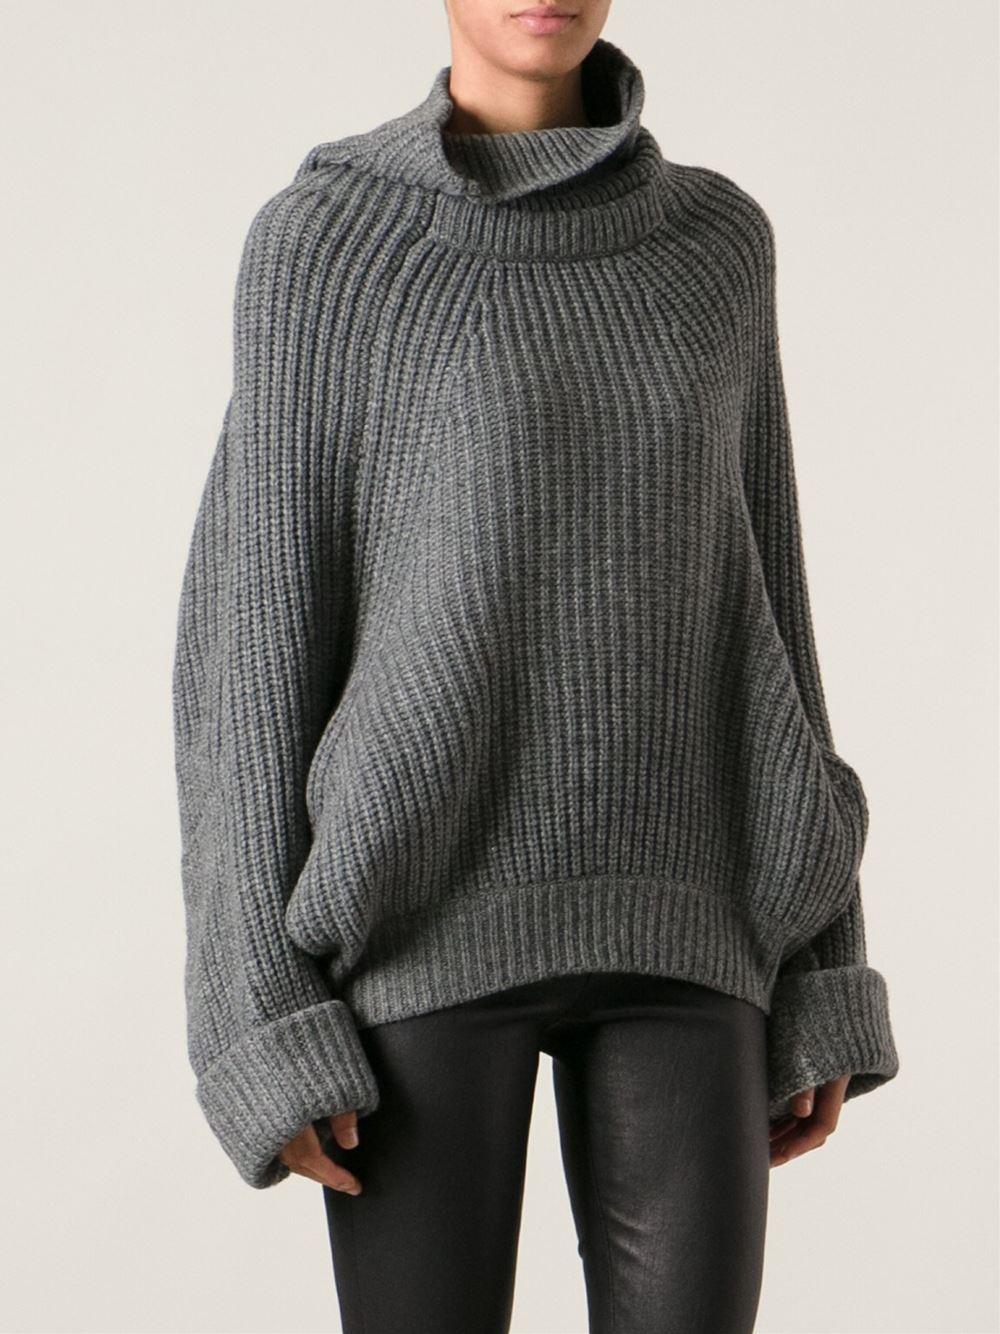 Turtleneck dress shirt sweater oversized springs